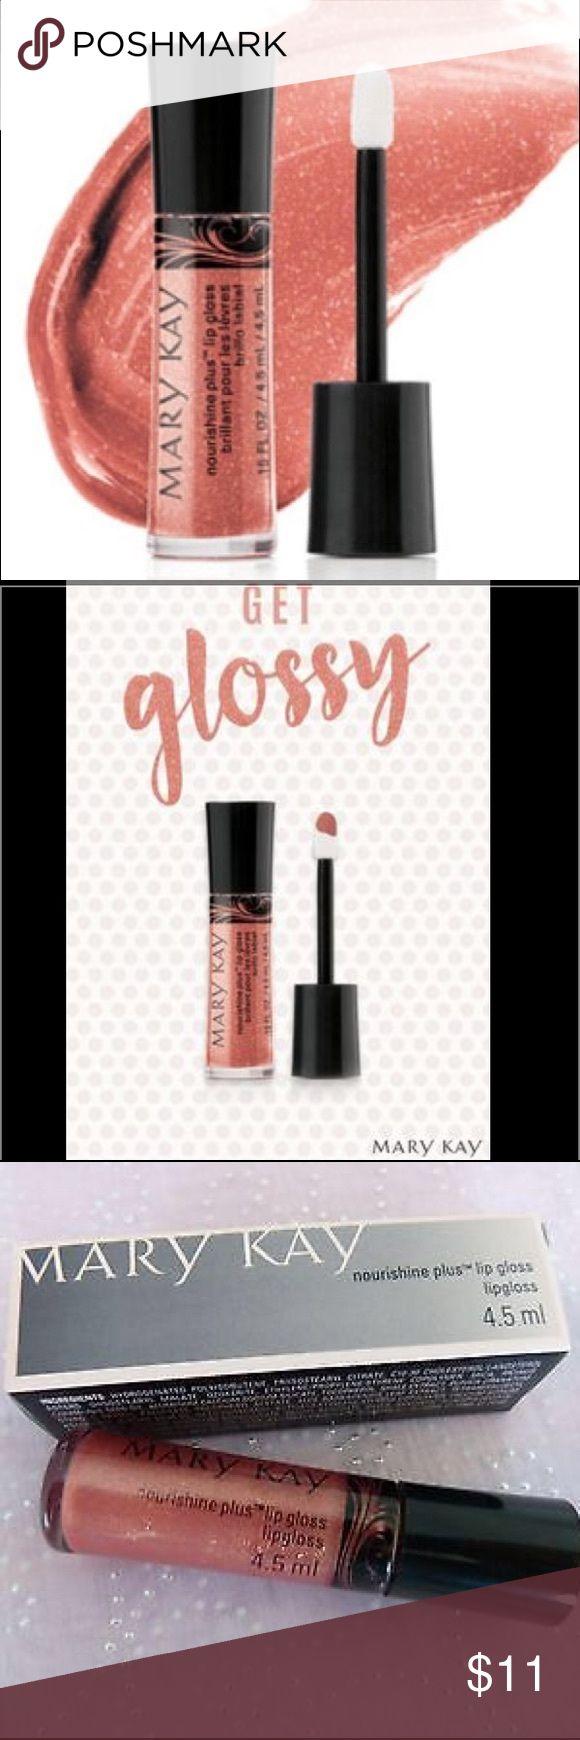 "NouriShine Plus® Lip Gloss Fancy Nancy New in a box Mary Kay NouriShine Plus® Lip Gloss ""Fancy Nancy"" Mary Kay Makeup Lipstick"